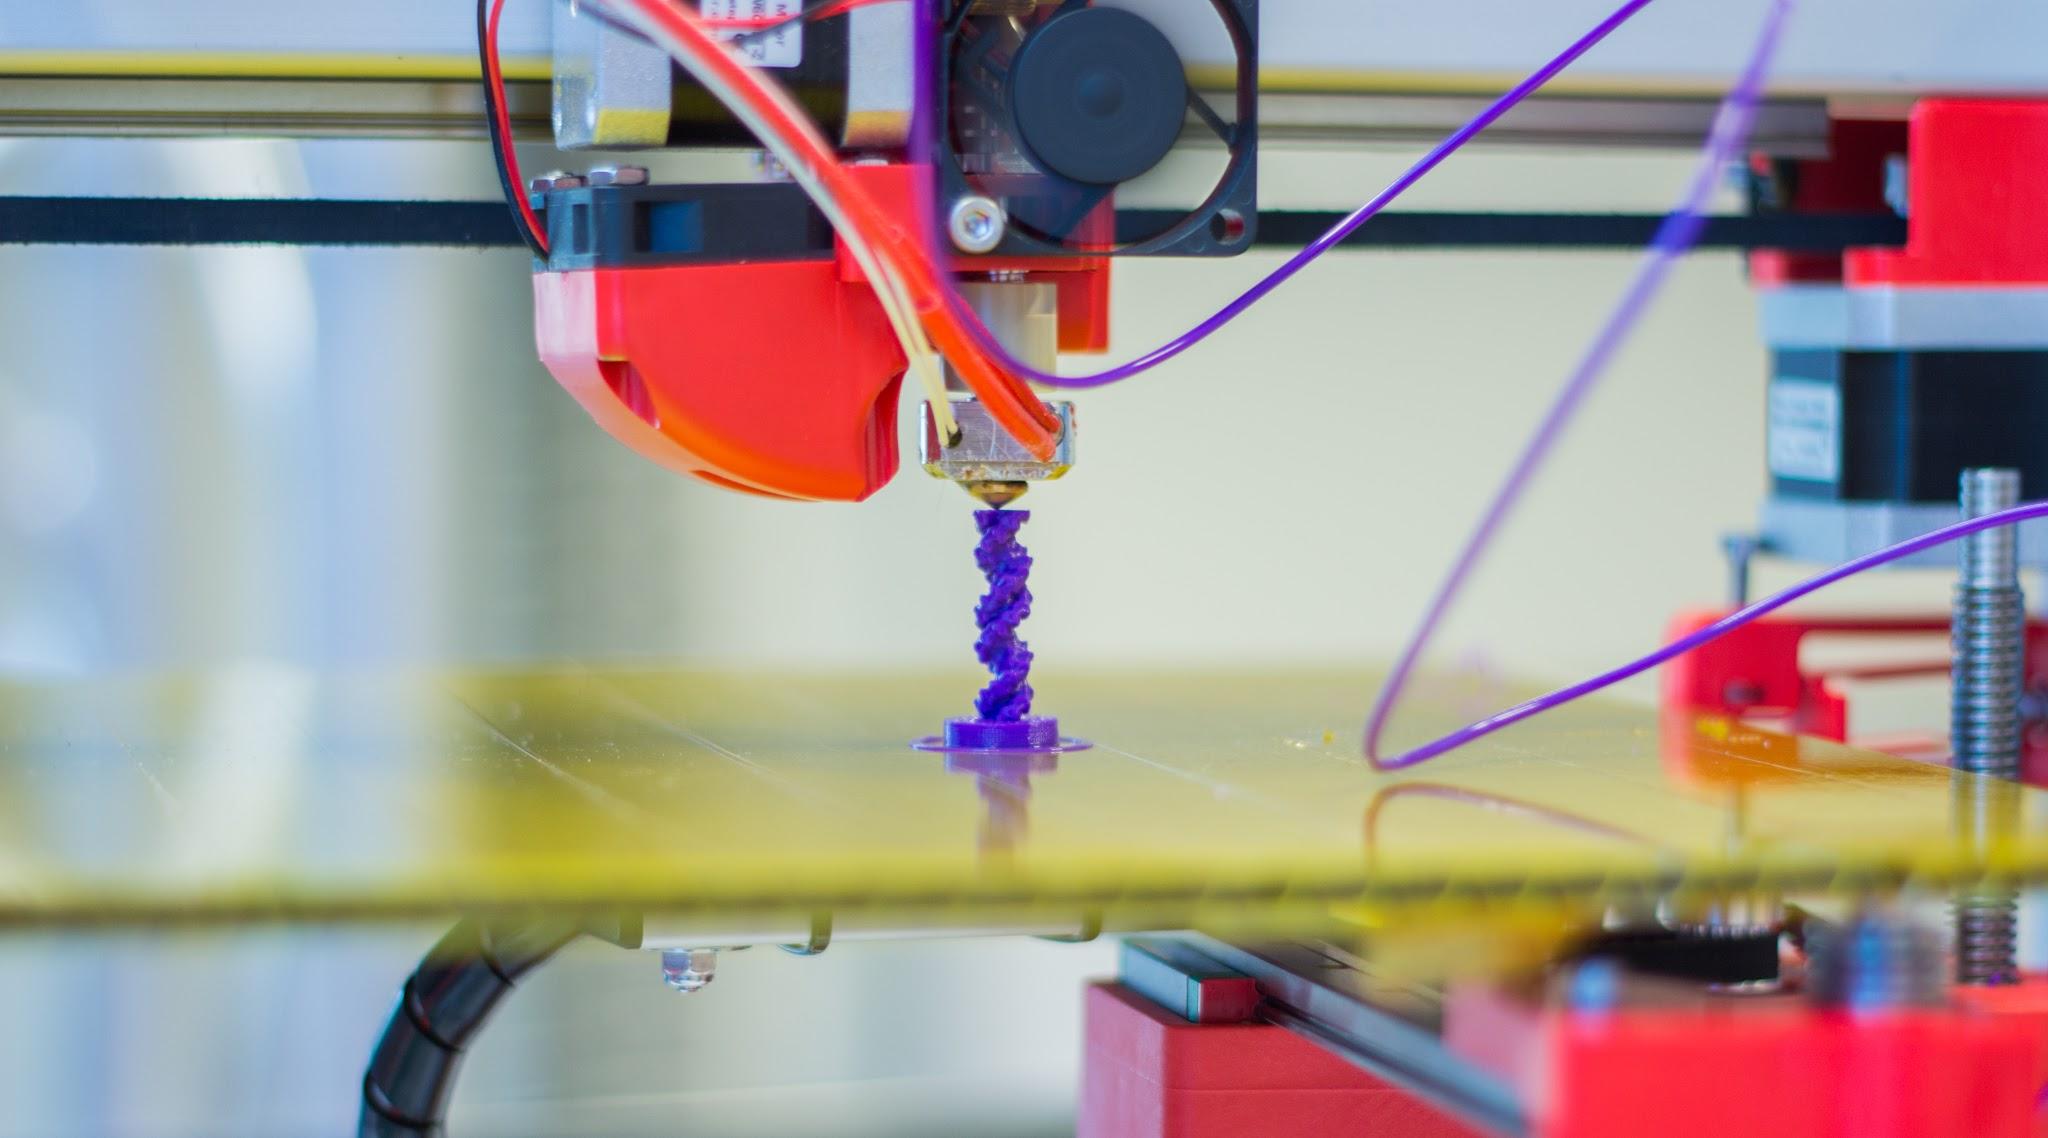 Felix_3D_Printer_-_Printing_Head.JPG